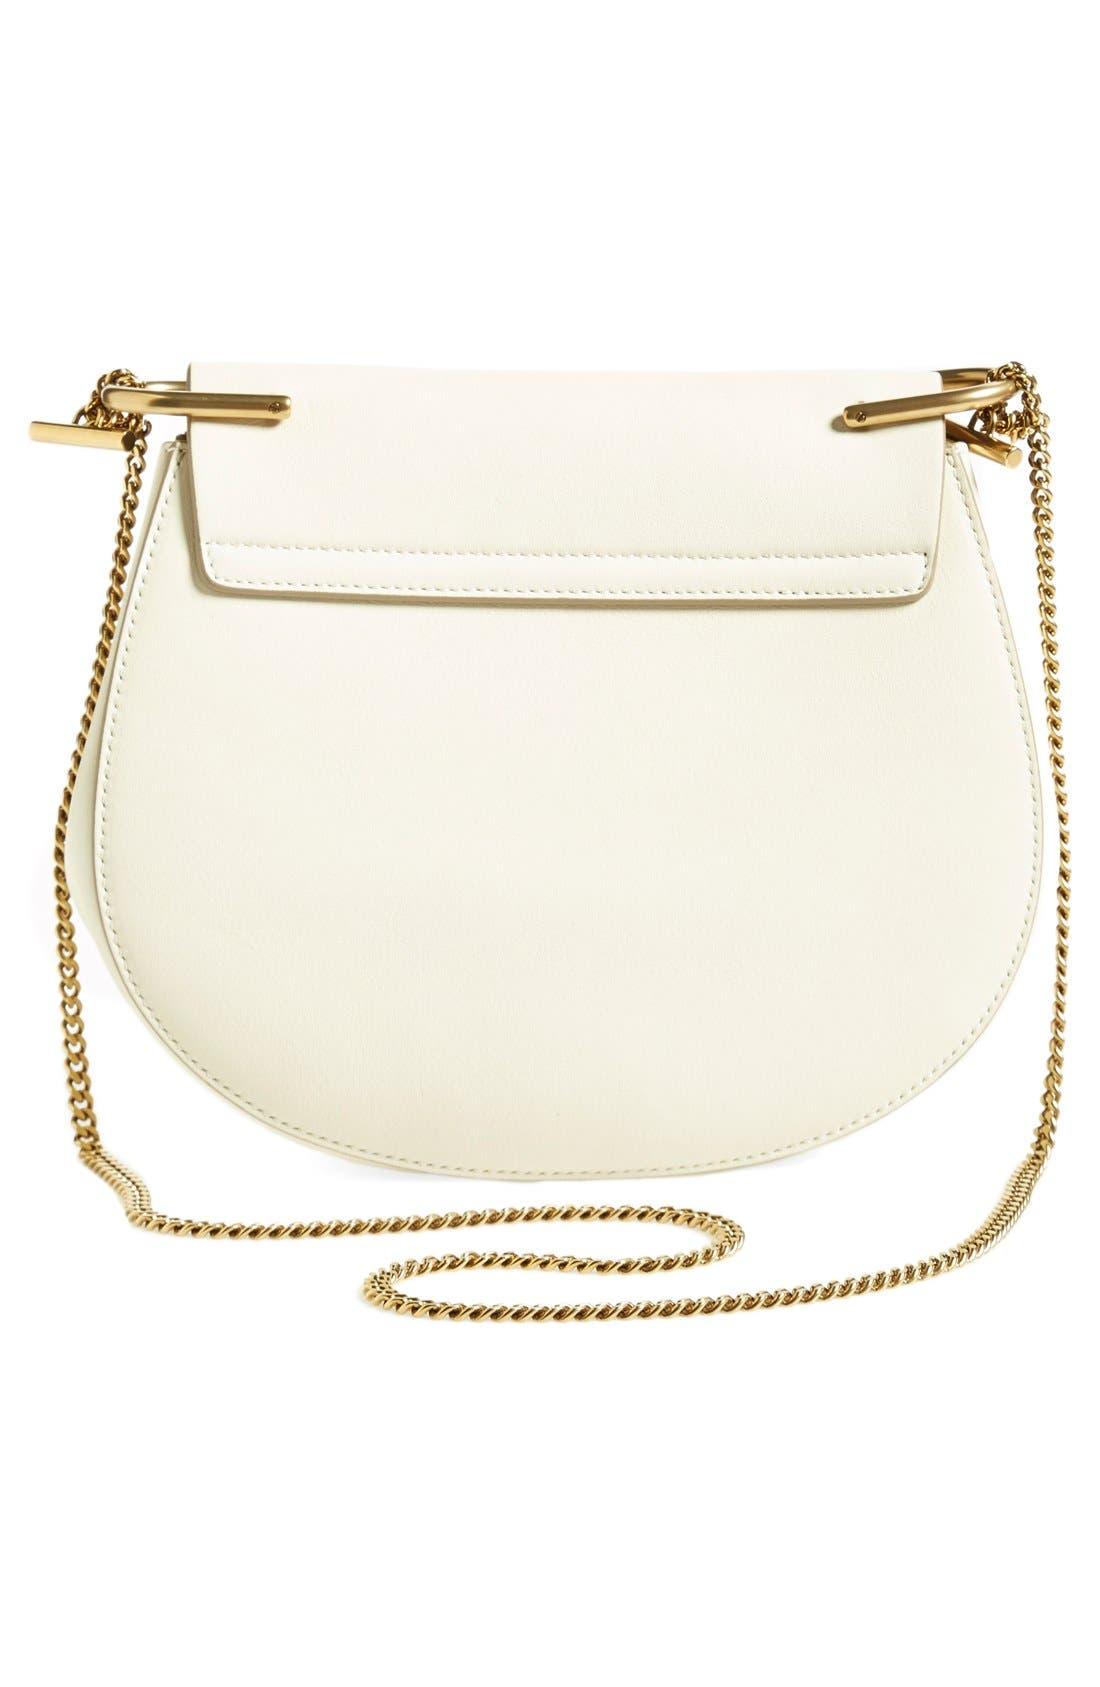 'Mini Drew' Calfskin Leather Shoulder Bag,                             Alternate thumbnail 2, color,                             100